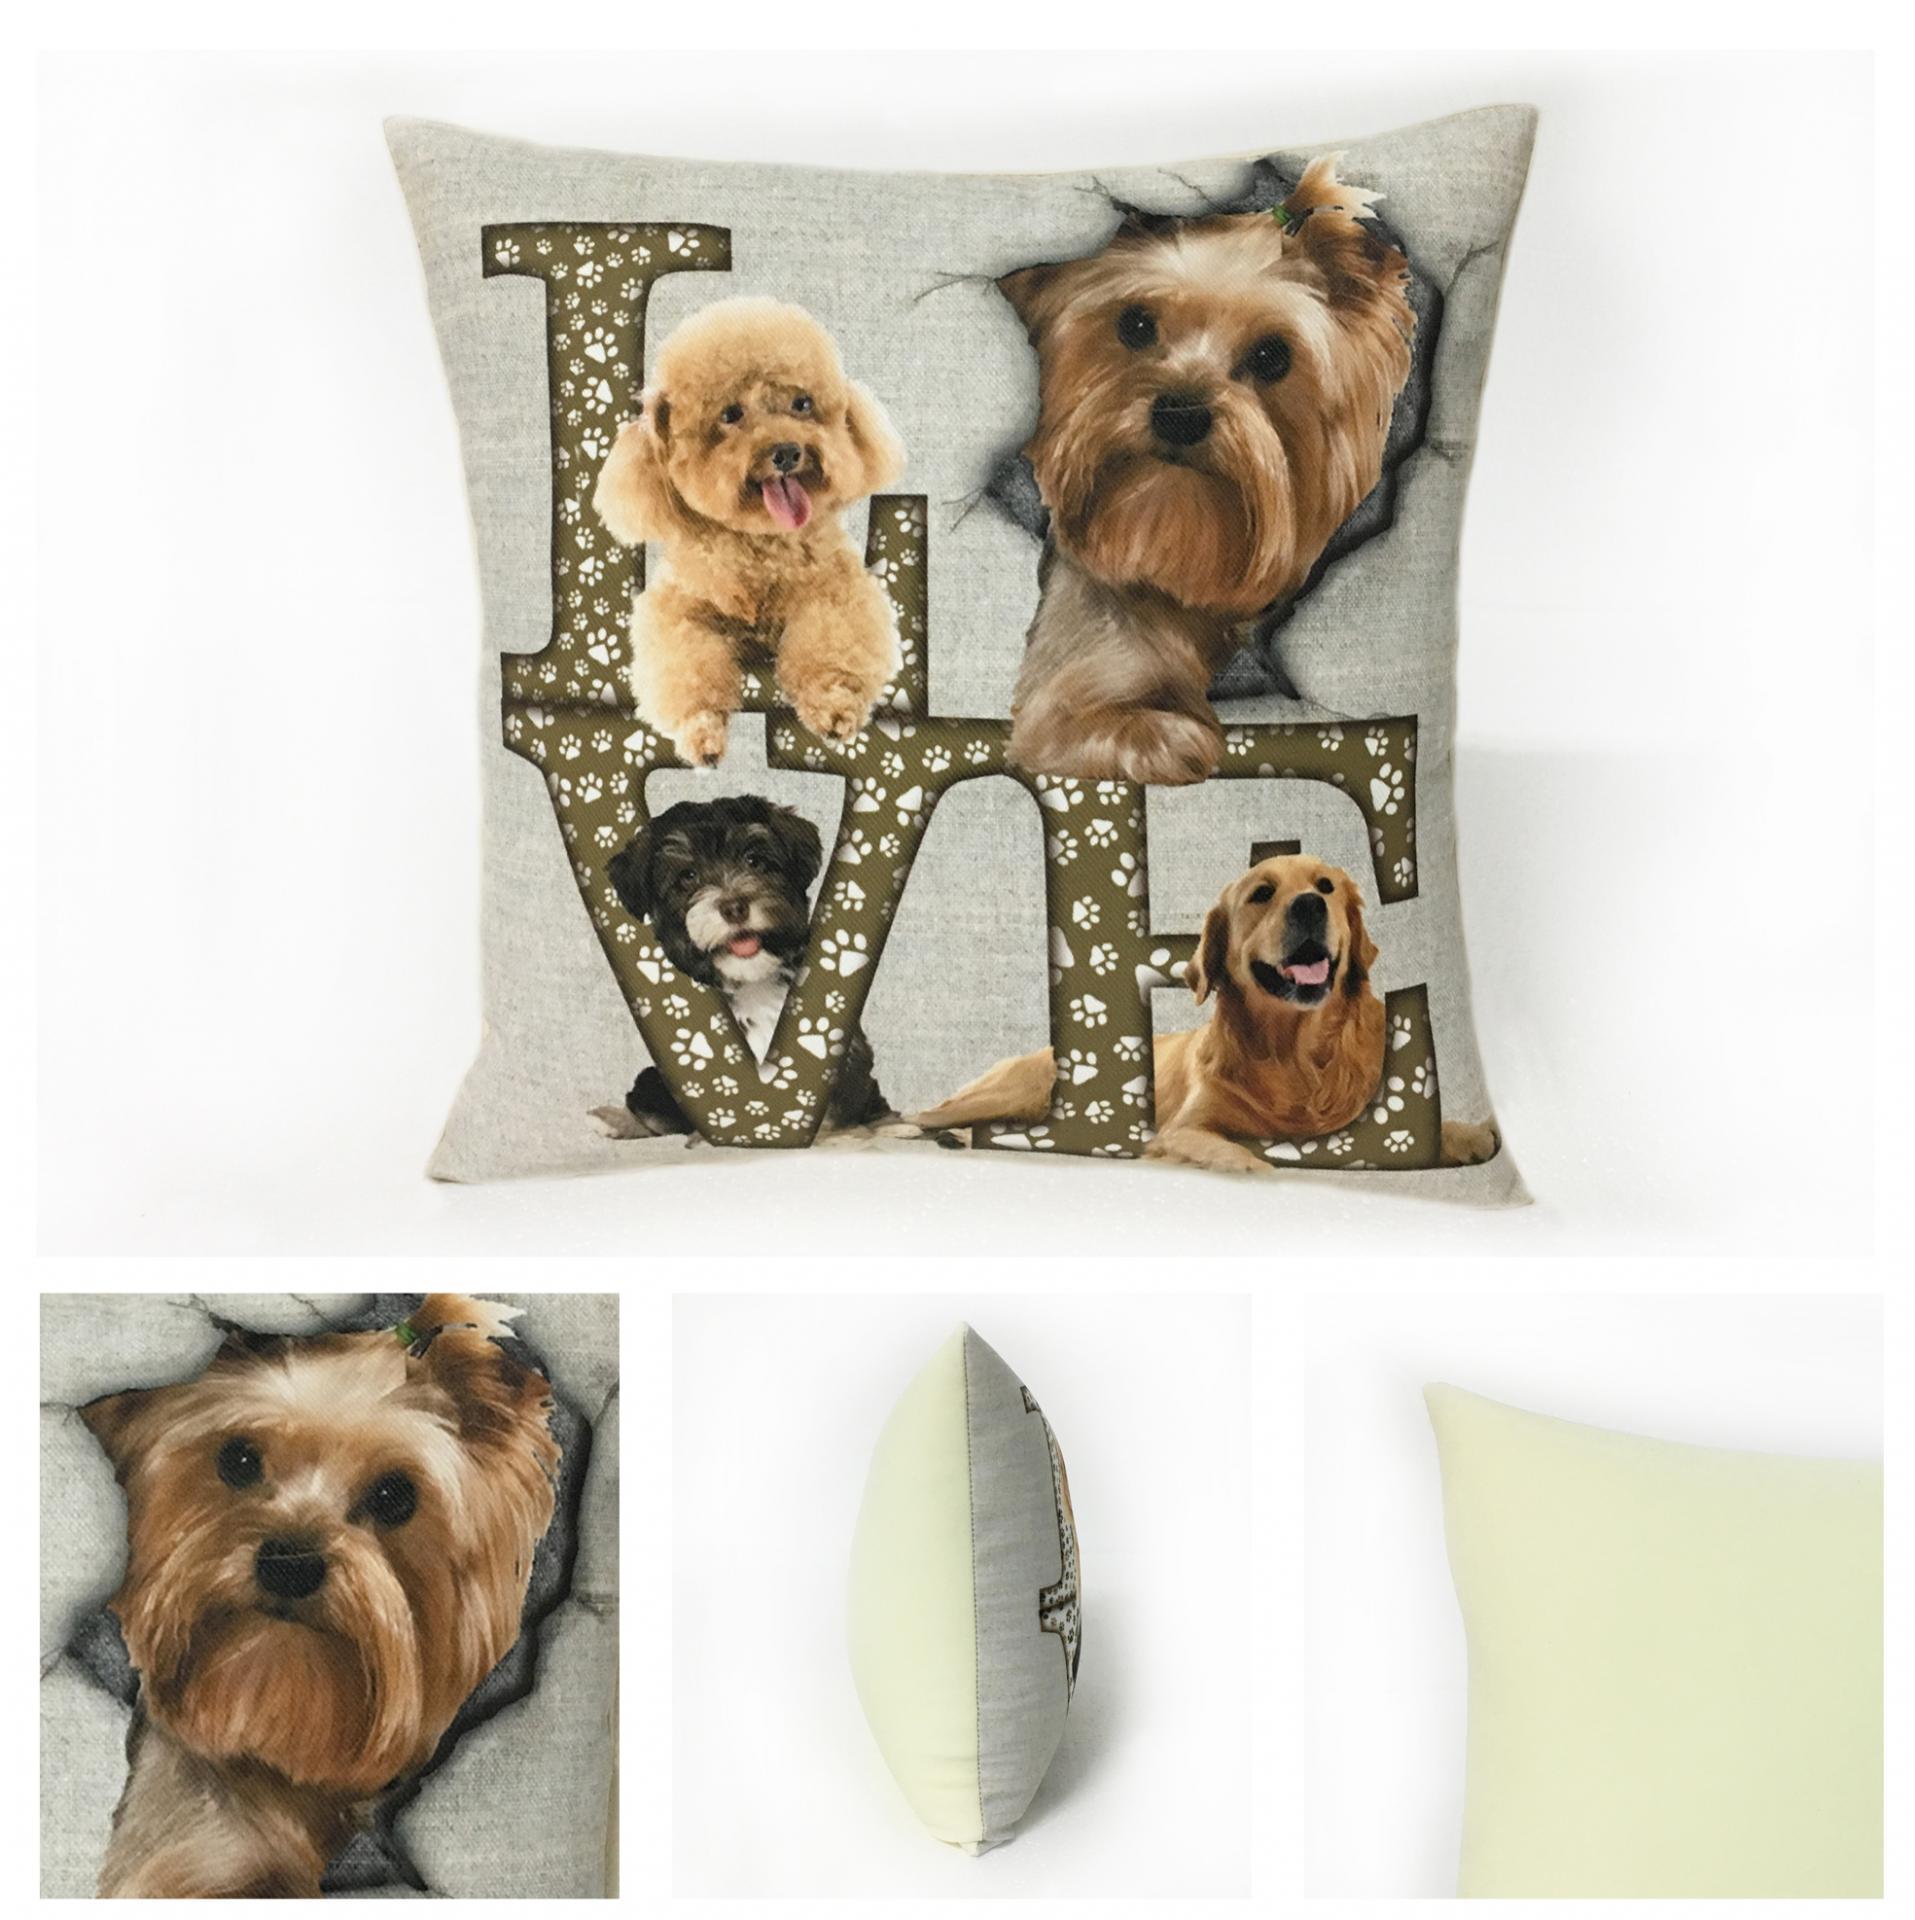 cojinlovemascotas-perros-23x23-0967-artemodel-lomejorsg.jpg